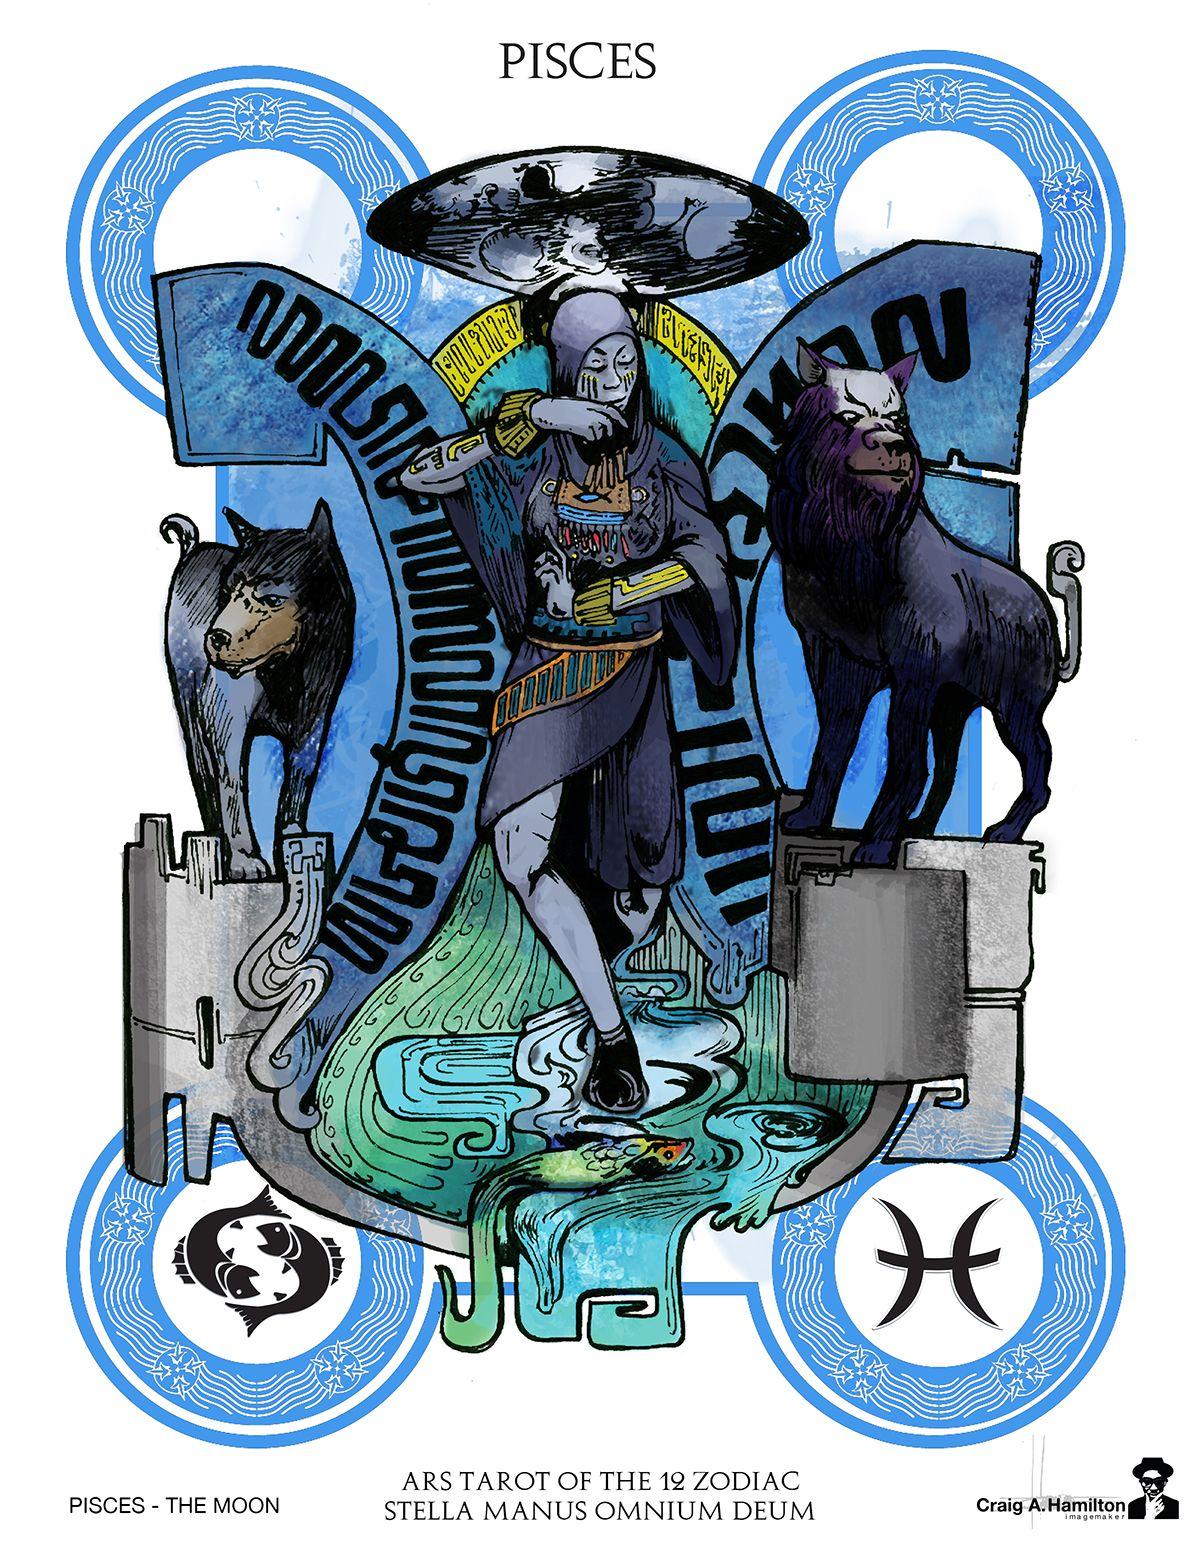 Ars zorot tarot of the 12 zodiac on behance 12 zodiac